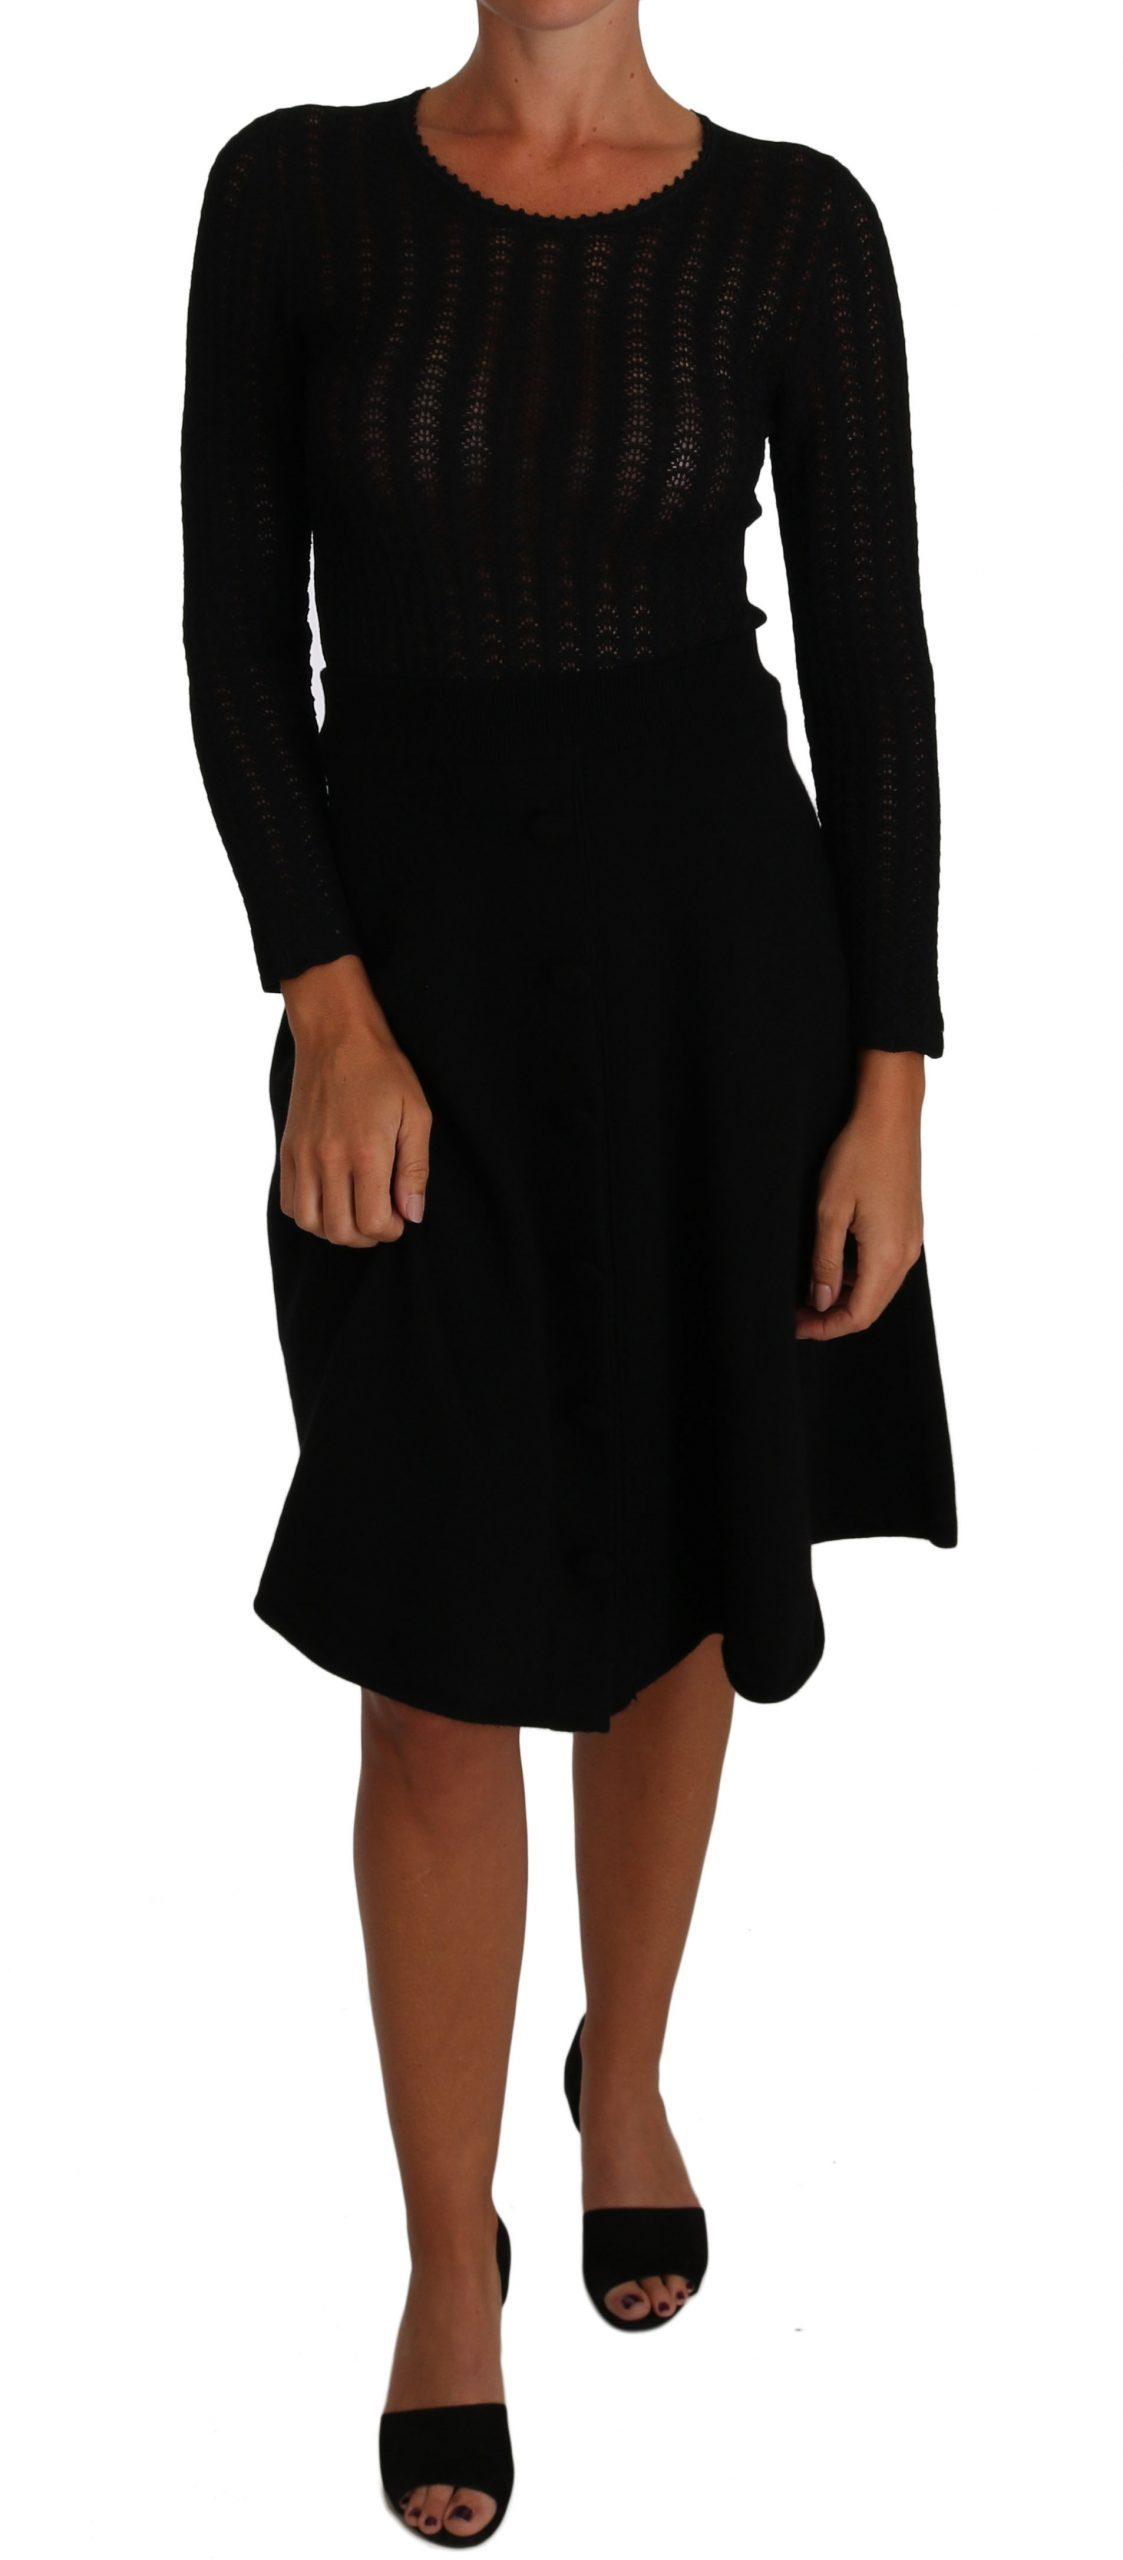 Dolce & Gabbana Women's Knitted Wool Sheath LS Dress Black DR1503 - IT40|S